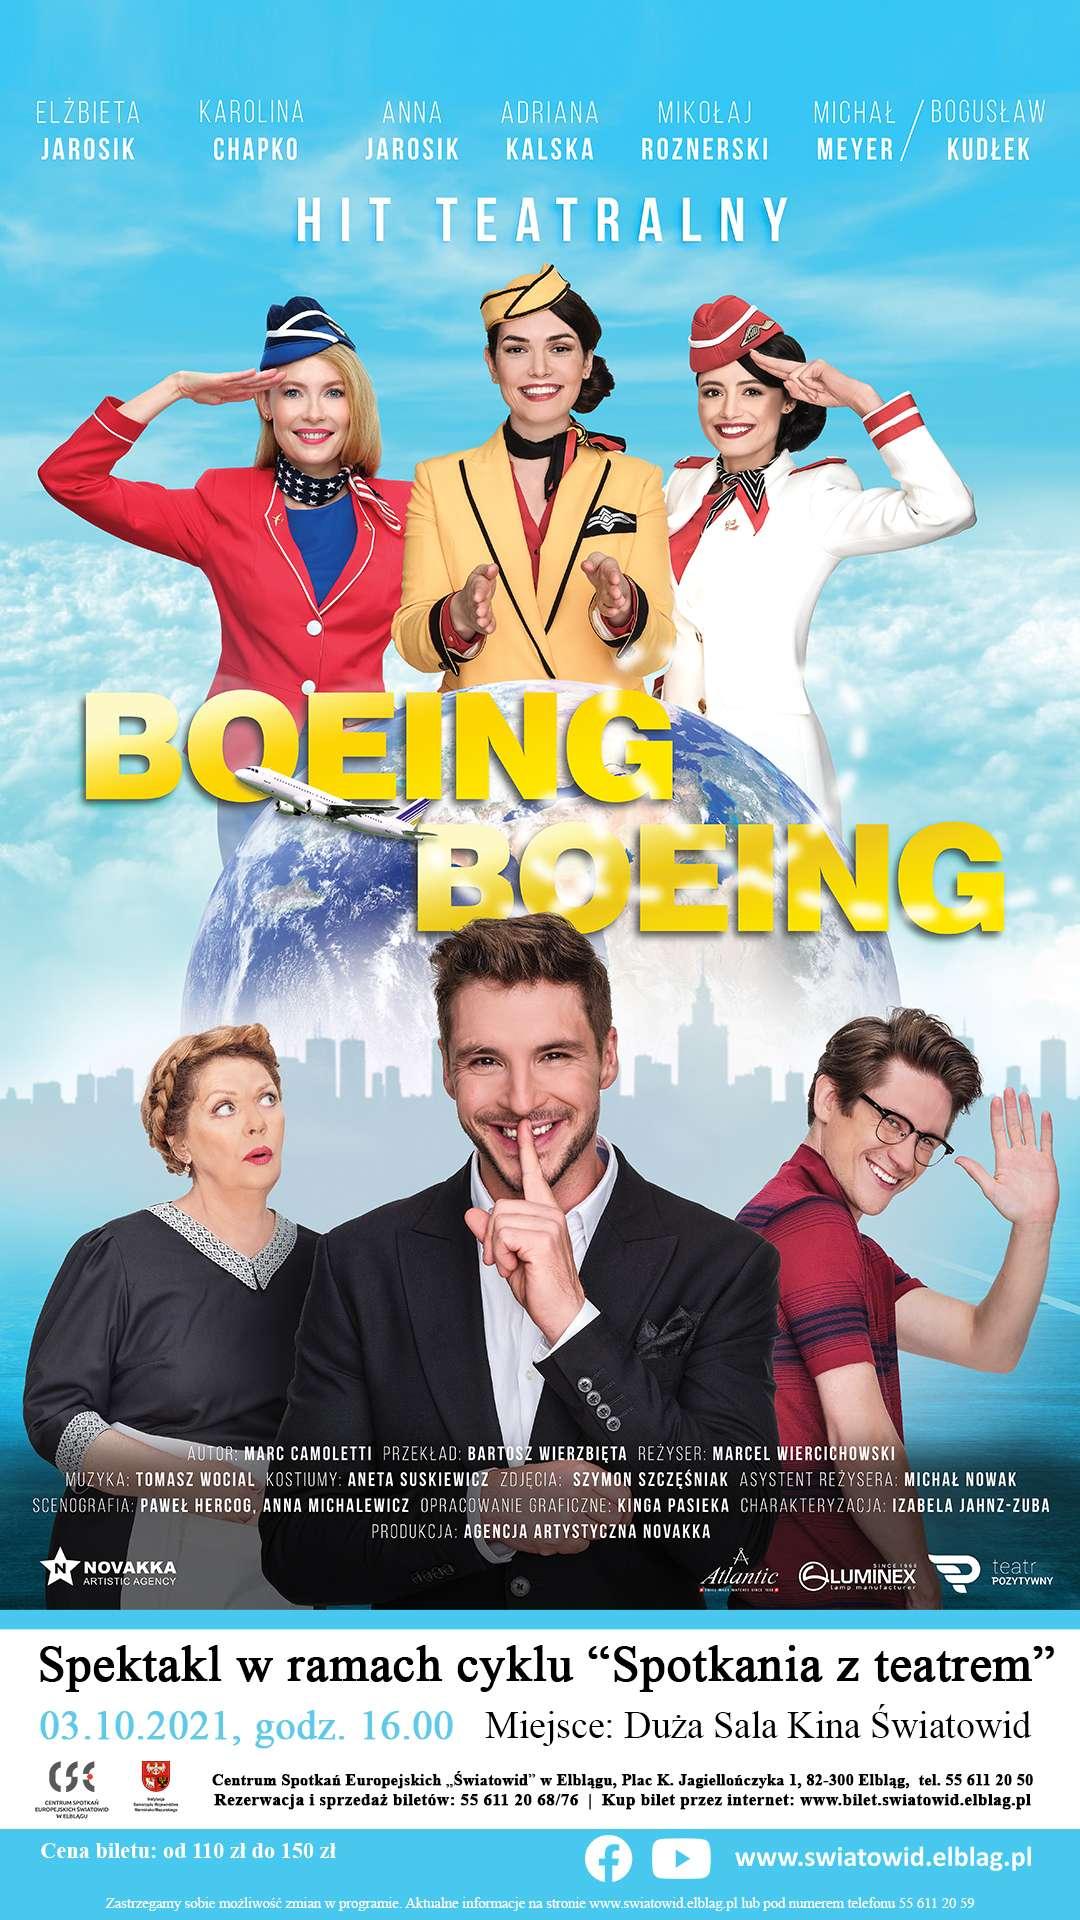 Hit teatralny - Boeing Boeing!